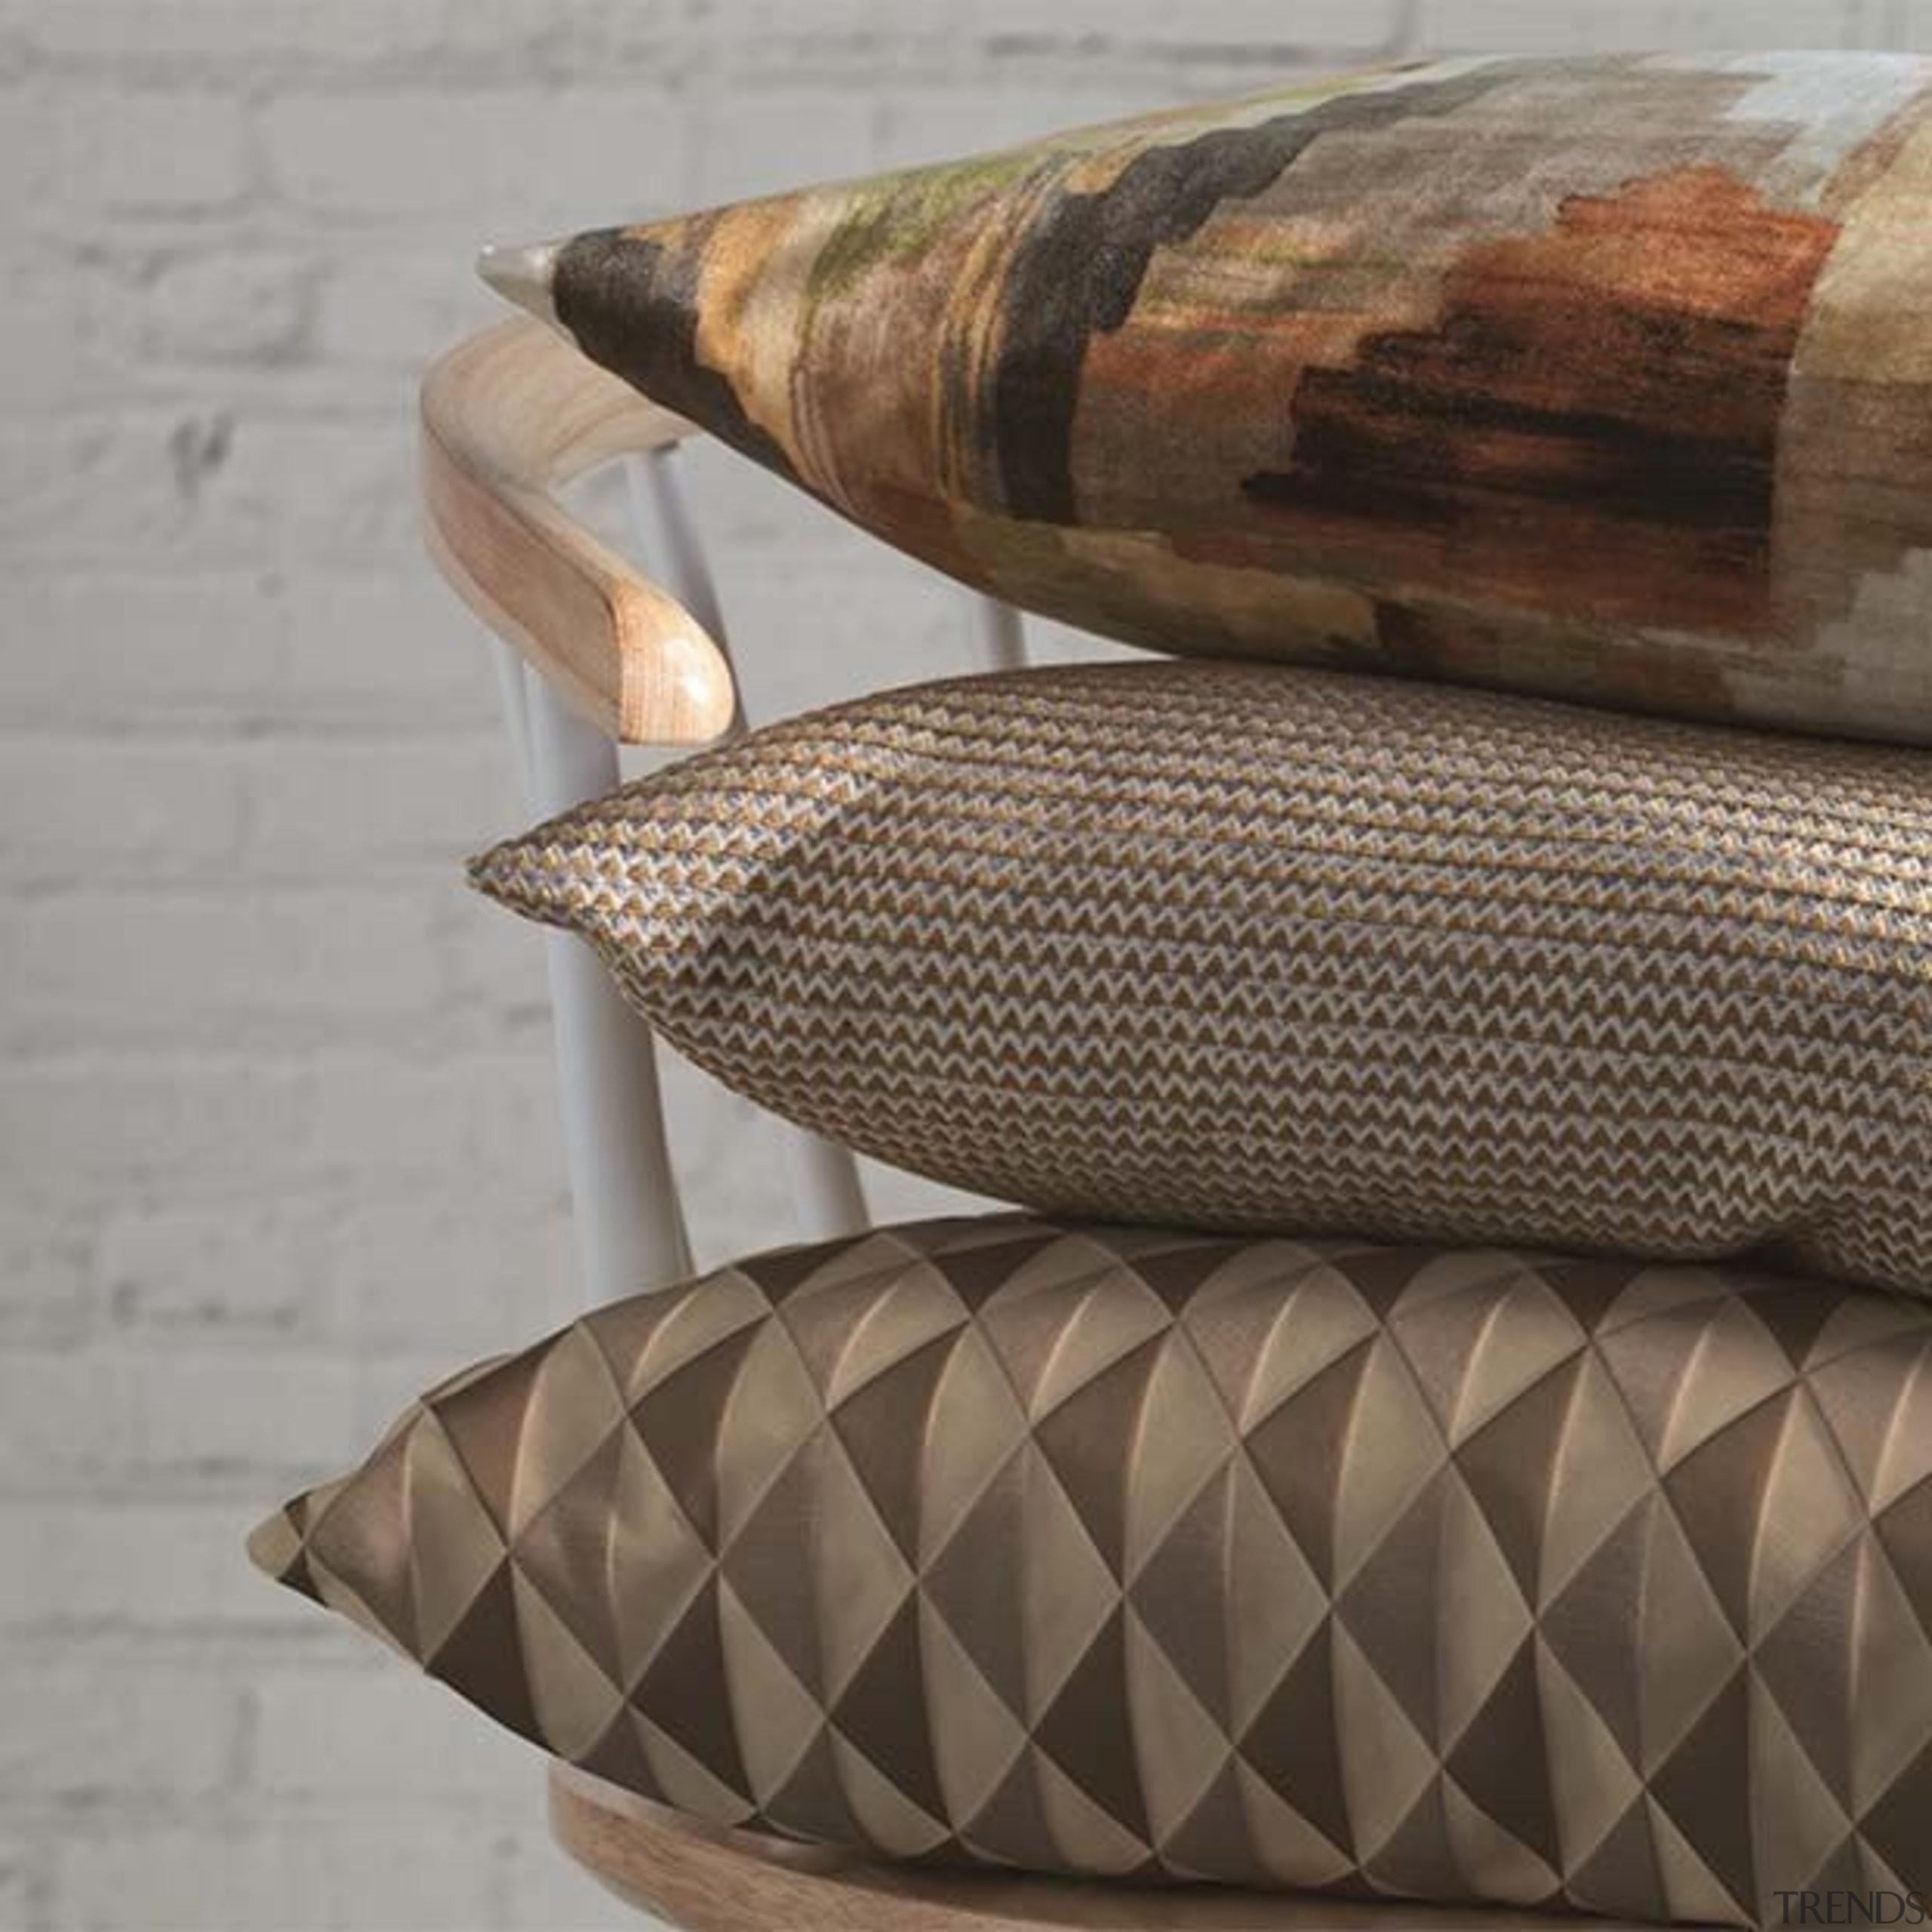 Kaleidoscope 8 - Kaleidoscope 8 - cushion | cushion, furniture, gray, brown